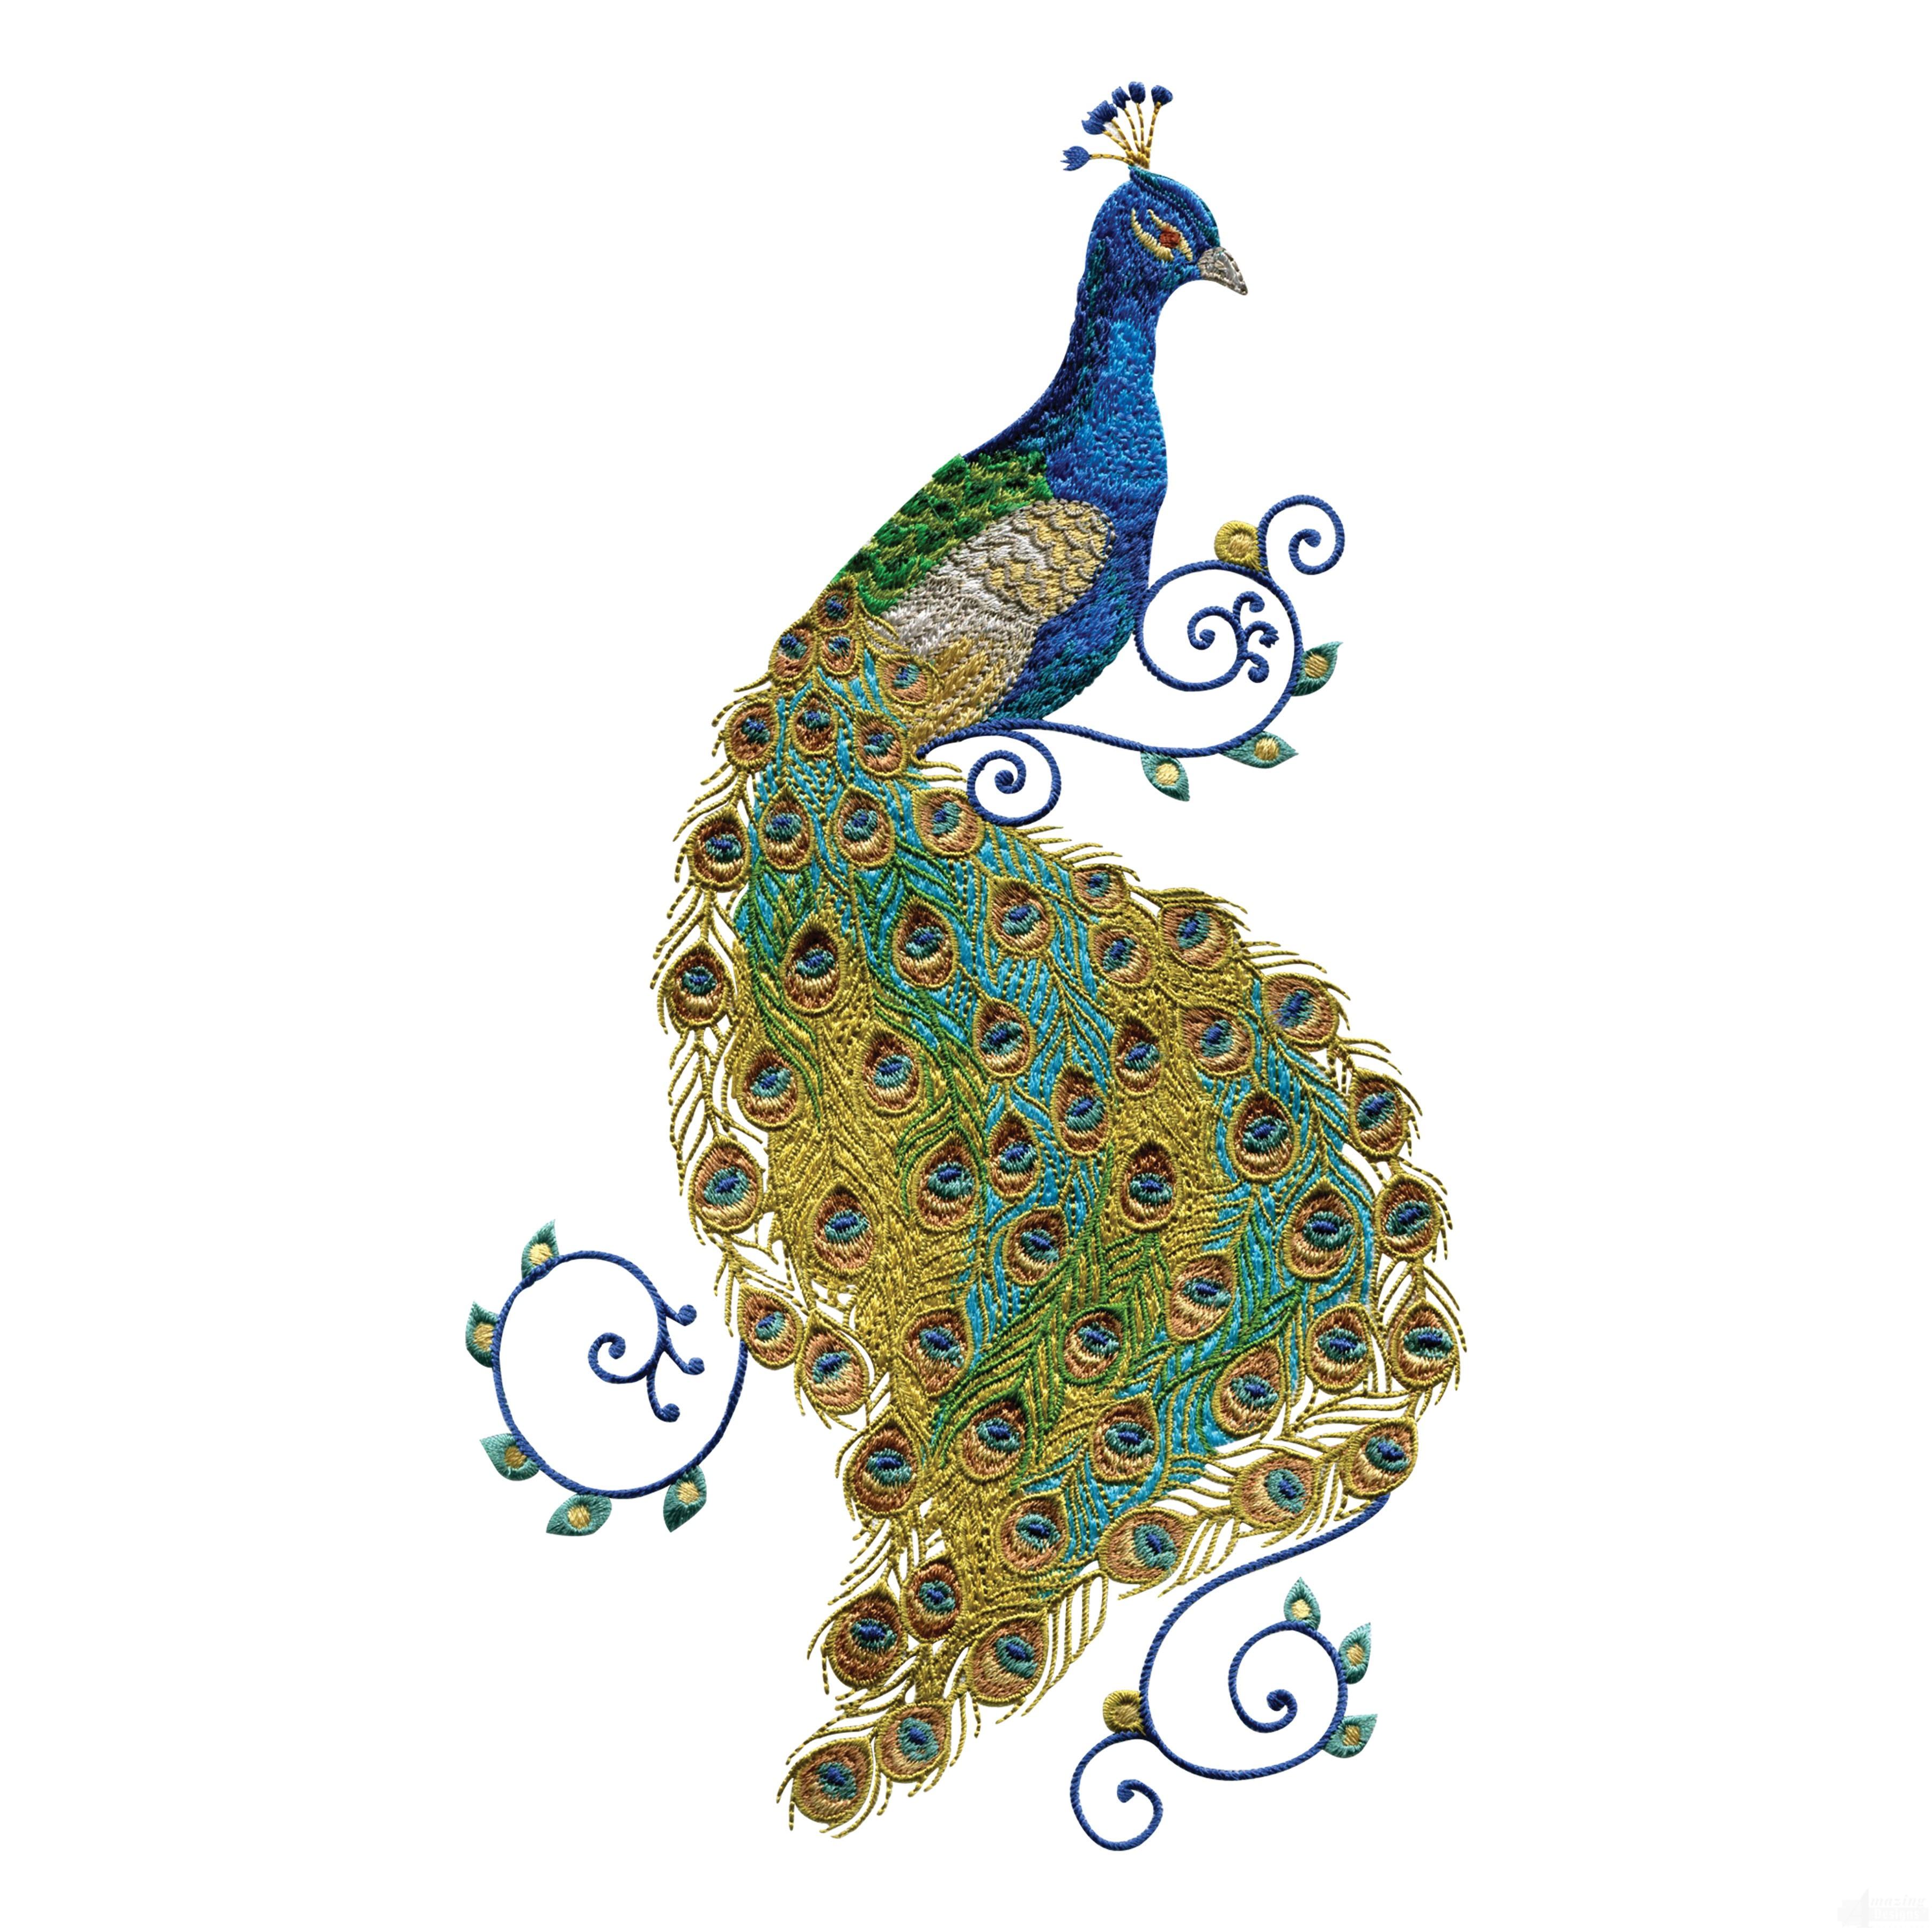 swnpa136 peacock embroidery design